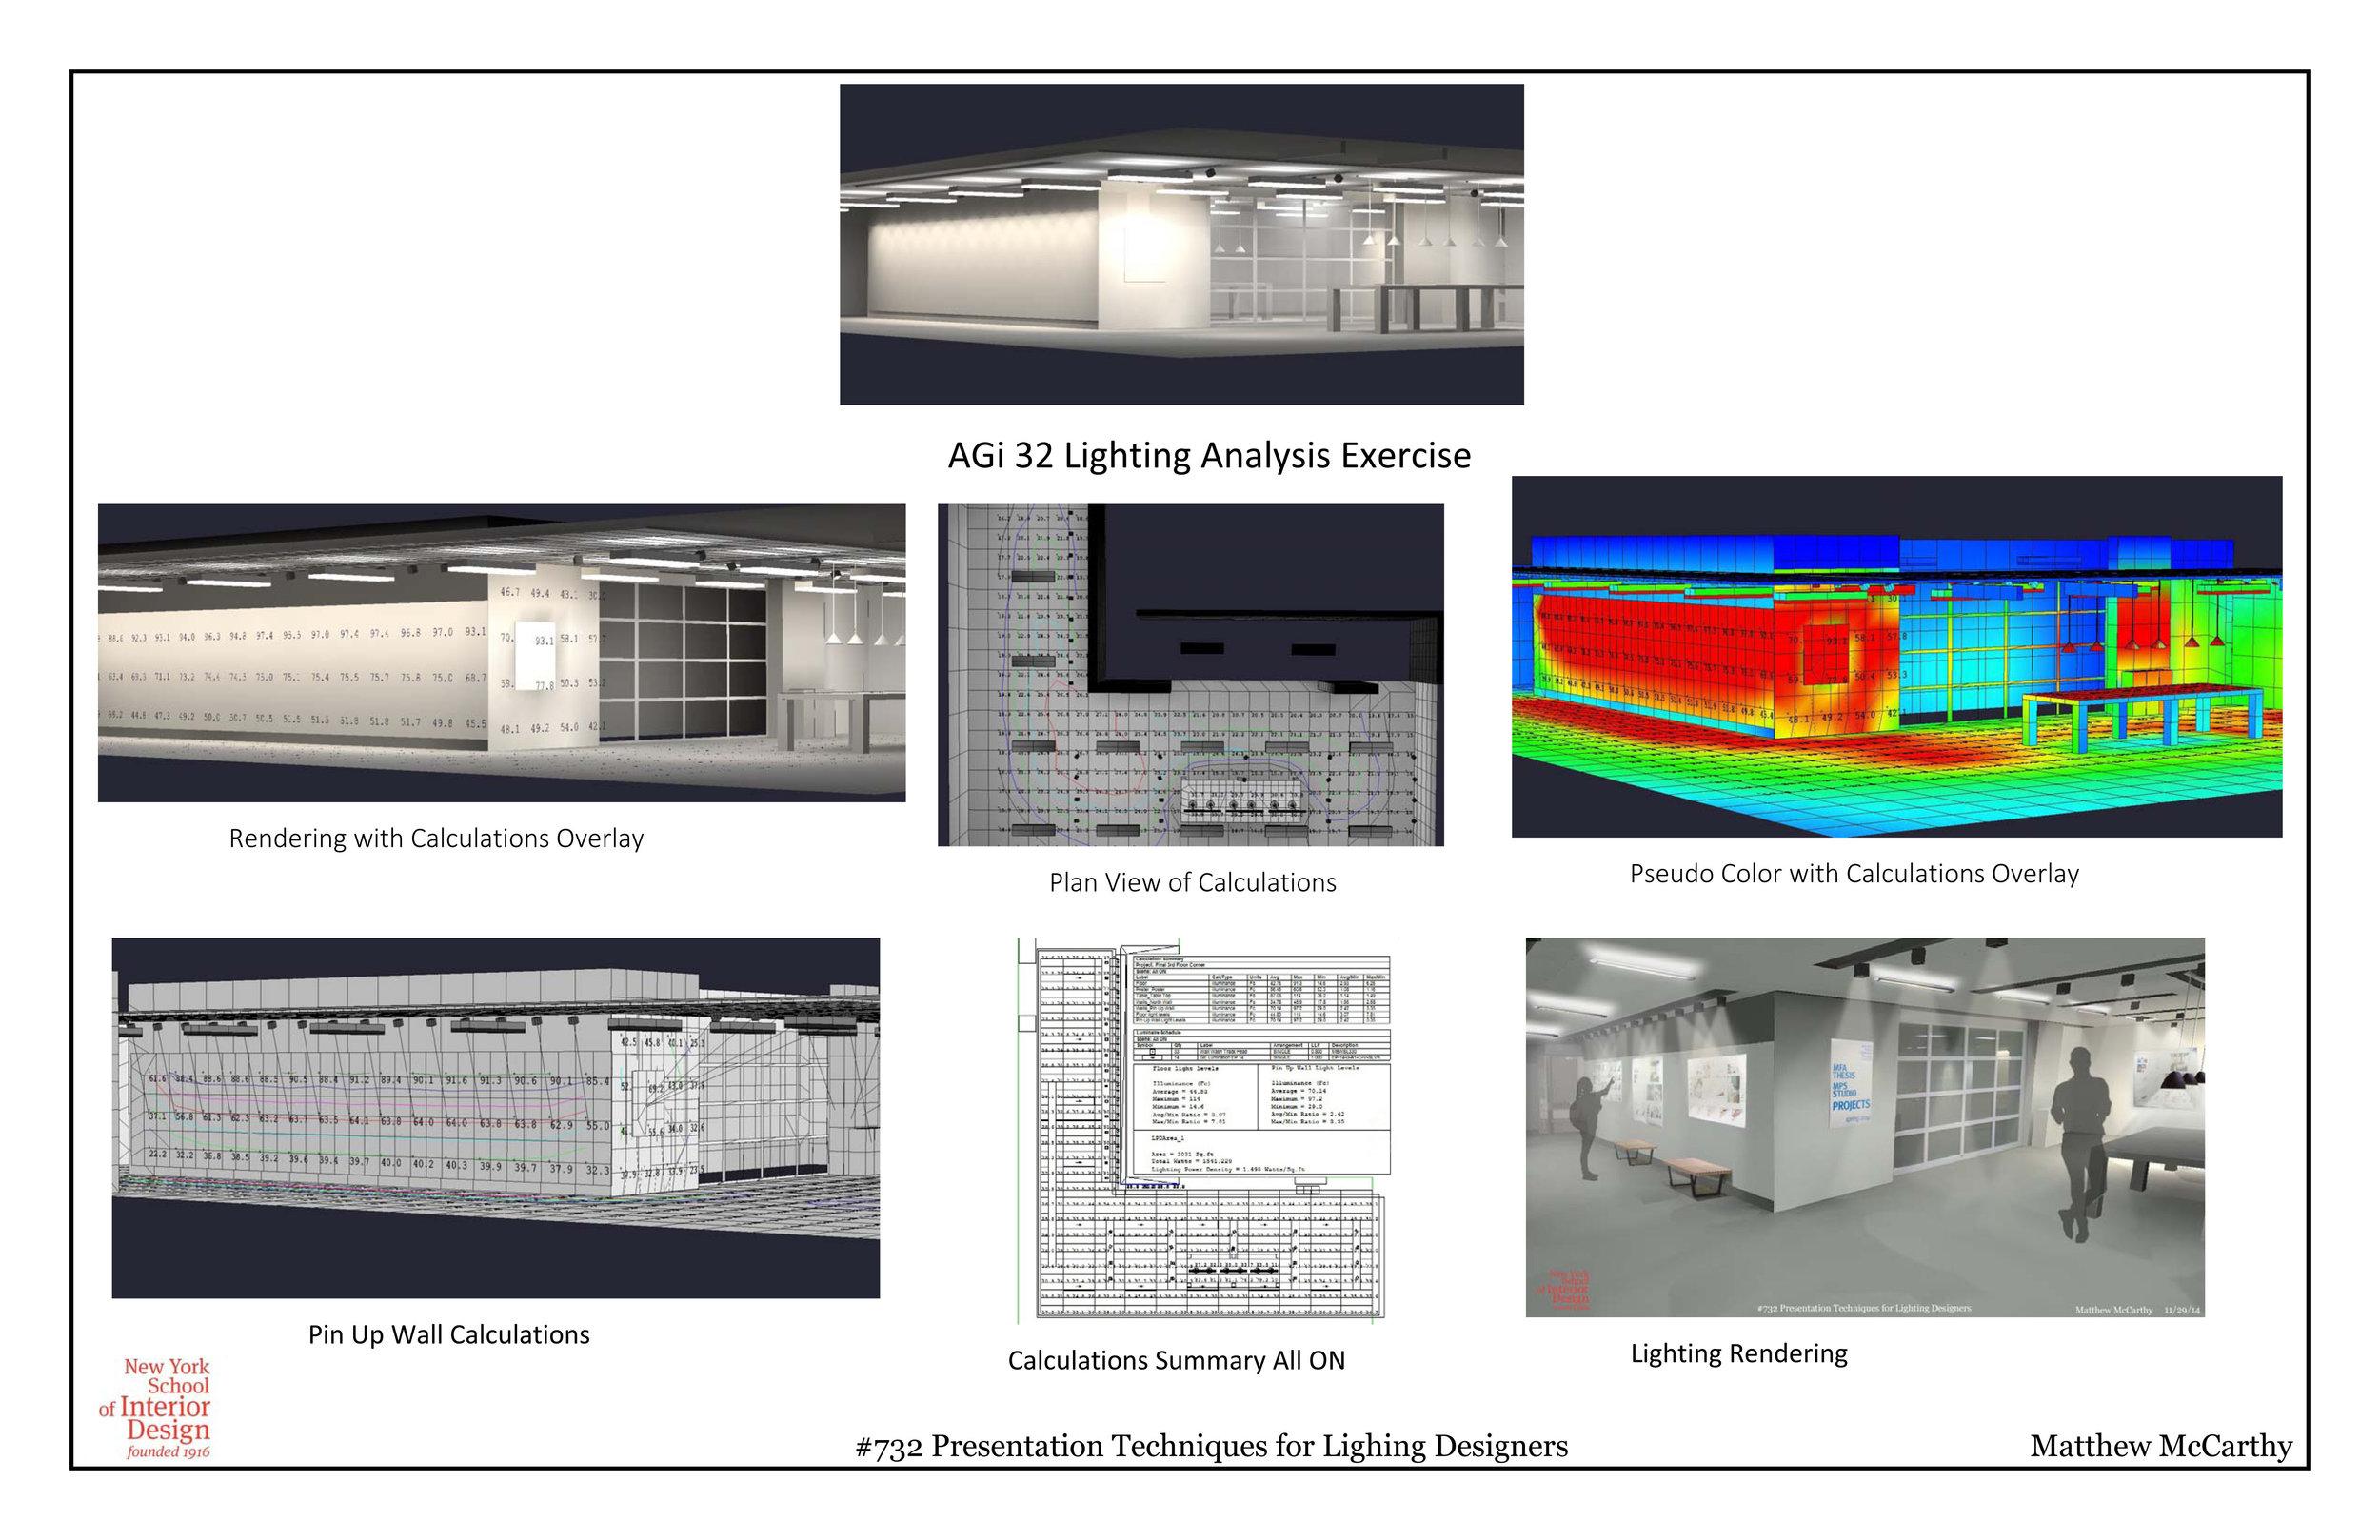 matthew-mccarthy-mps-interior-lighting-design-projects_17644502131_o.jpg